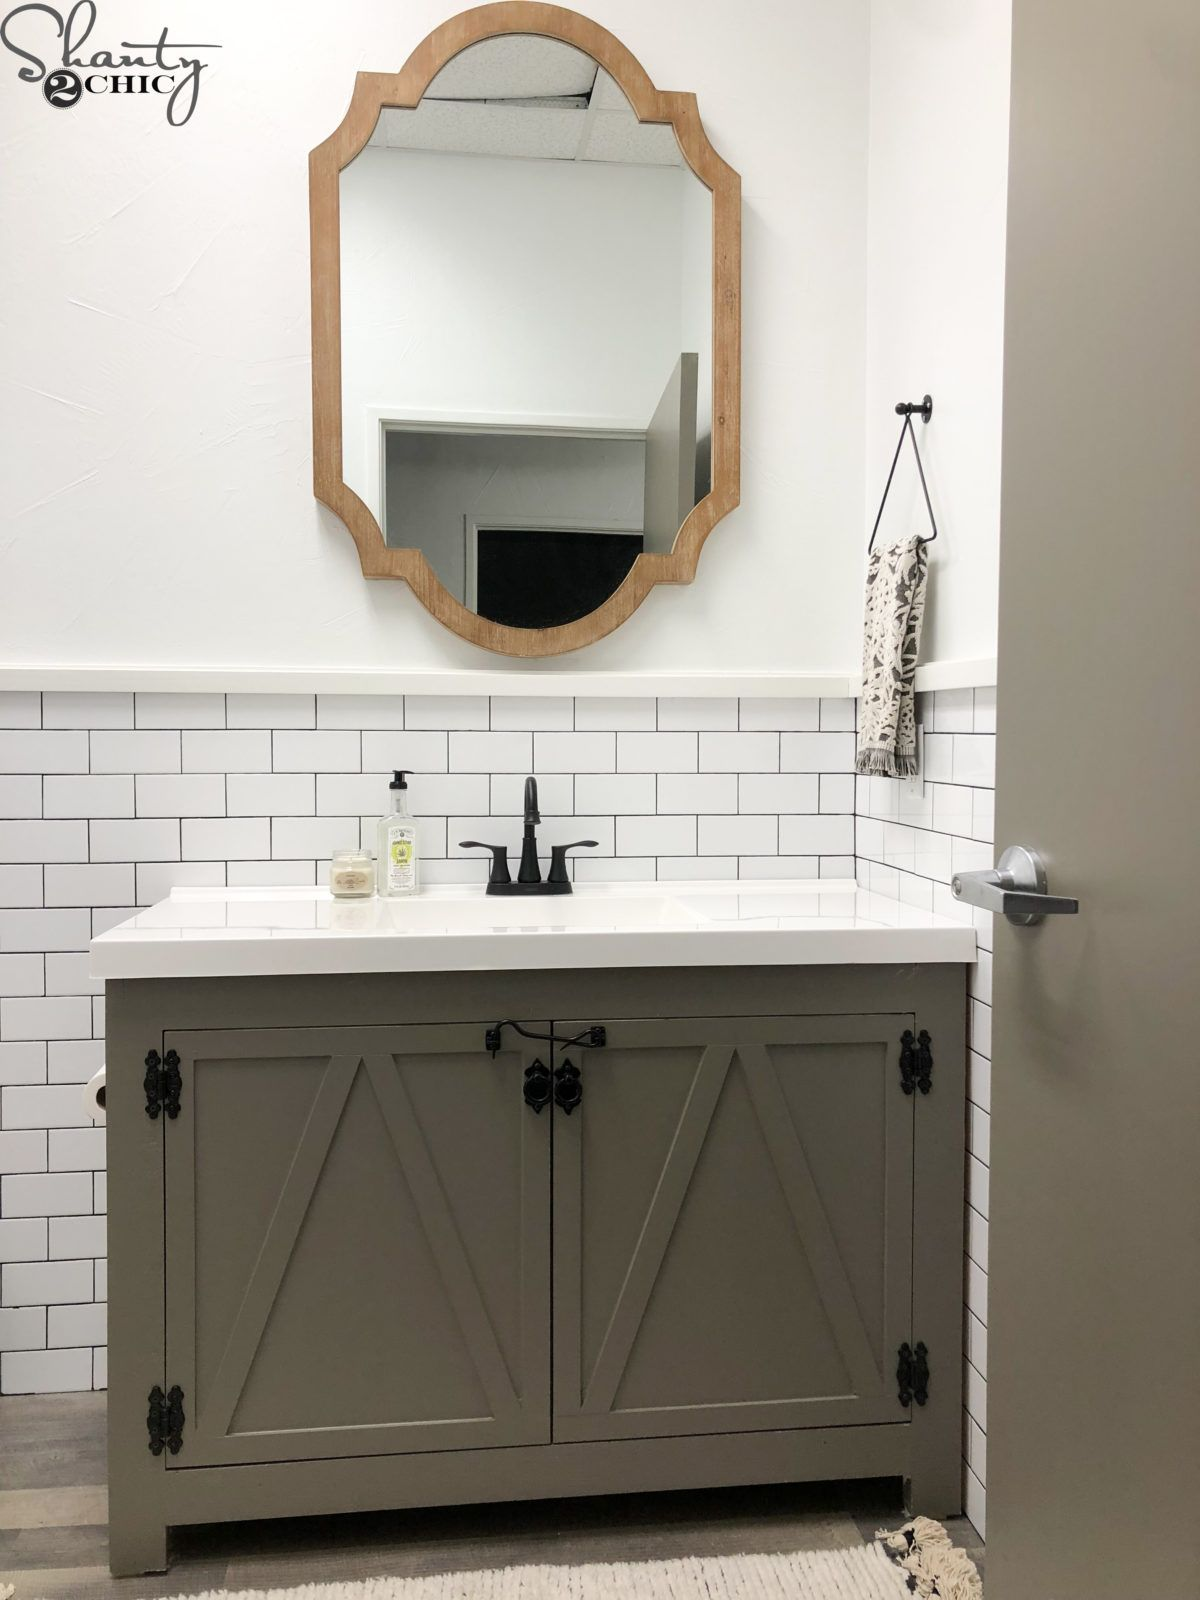 DIY Farmhouse Bathroom Vanity images